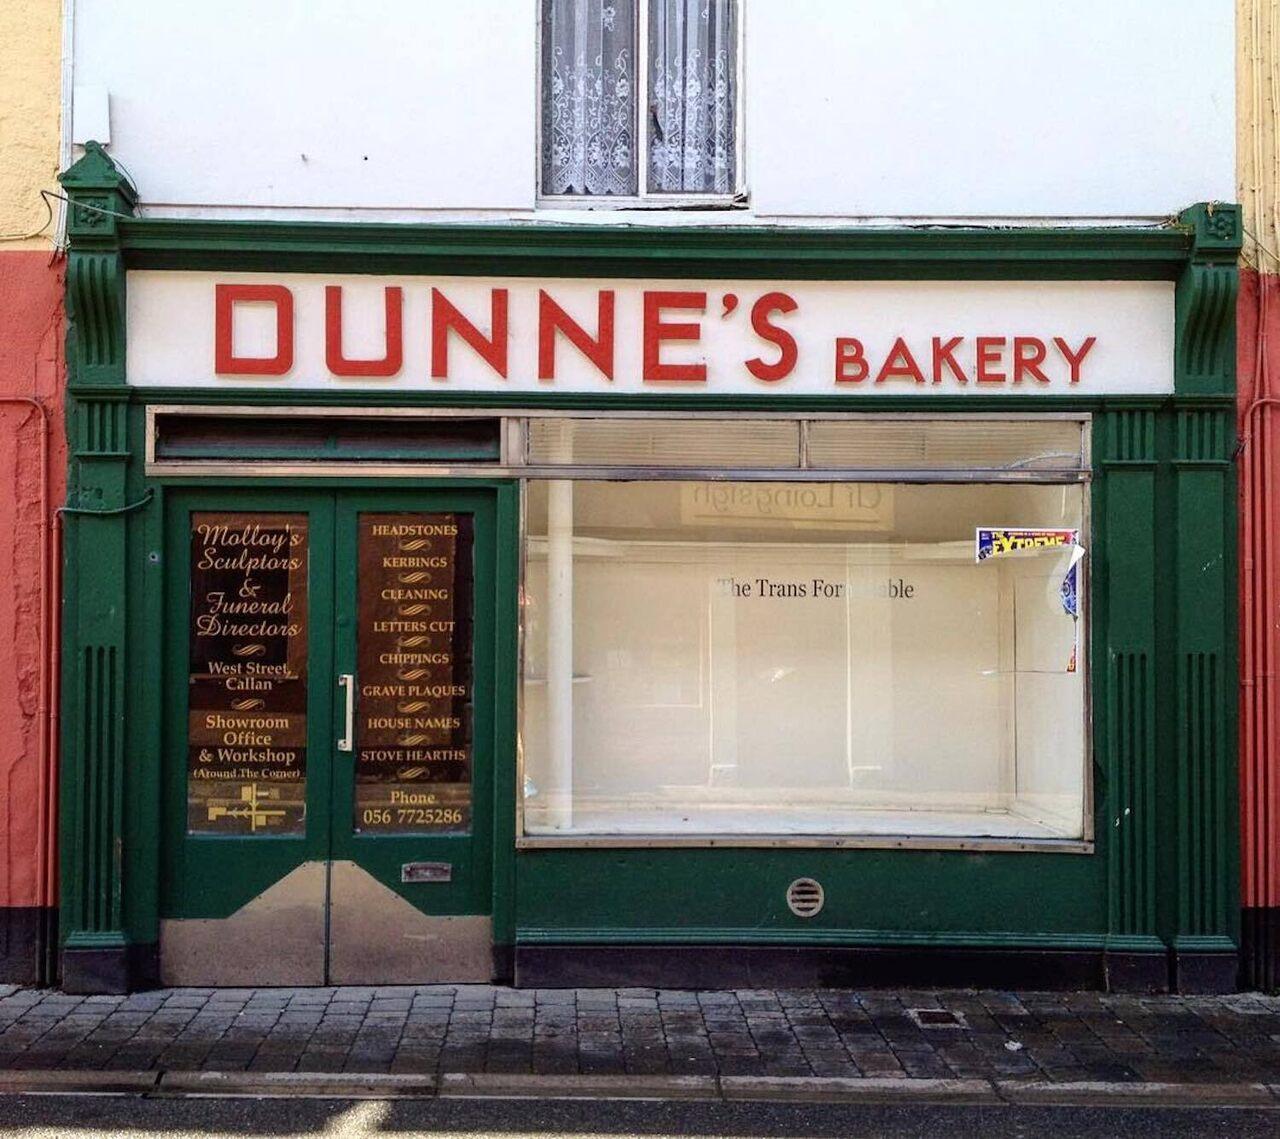 Dunne's Bakery, Callan, County Kilkenny.